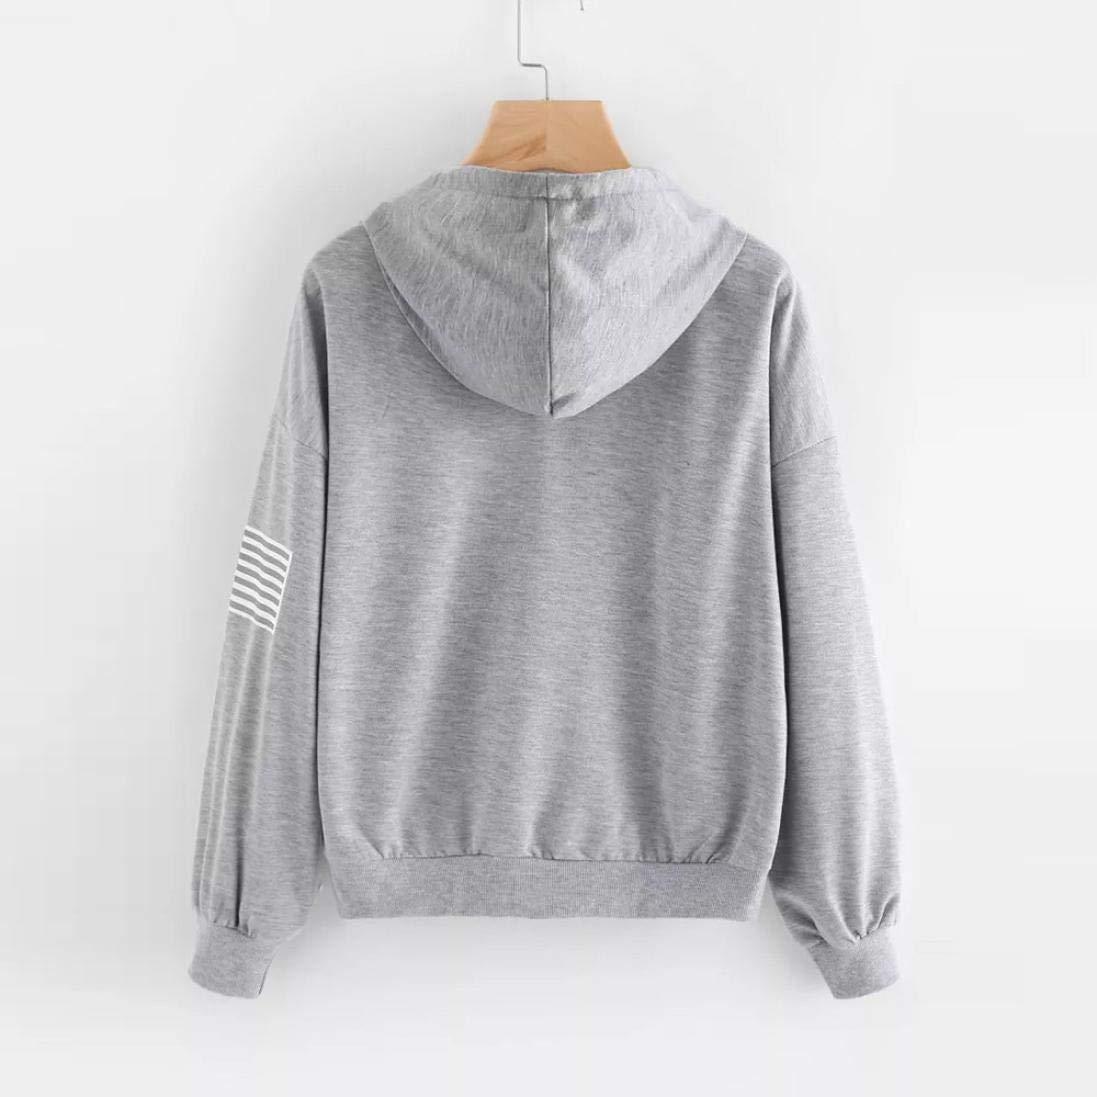 eb6251694a1503 Huihong Mädchen Teenager Hoodies Brief Flagge Druck Mode Kapuzen Sweatshirt  Damen Langarm Pullover Tops Bluse Streetwear